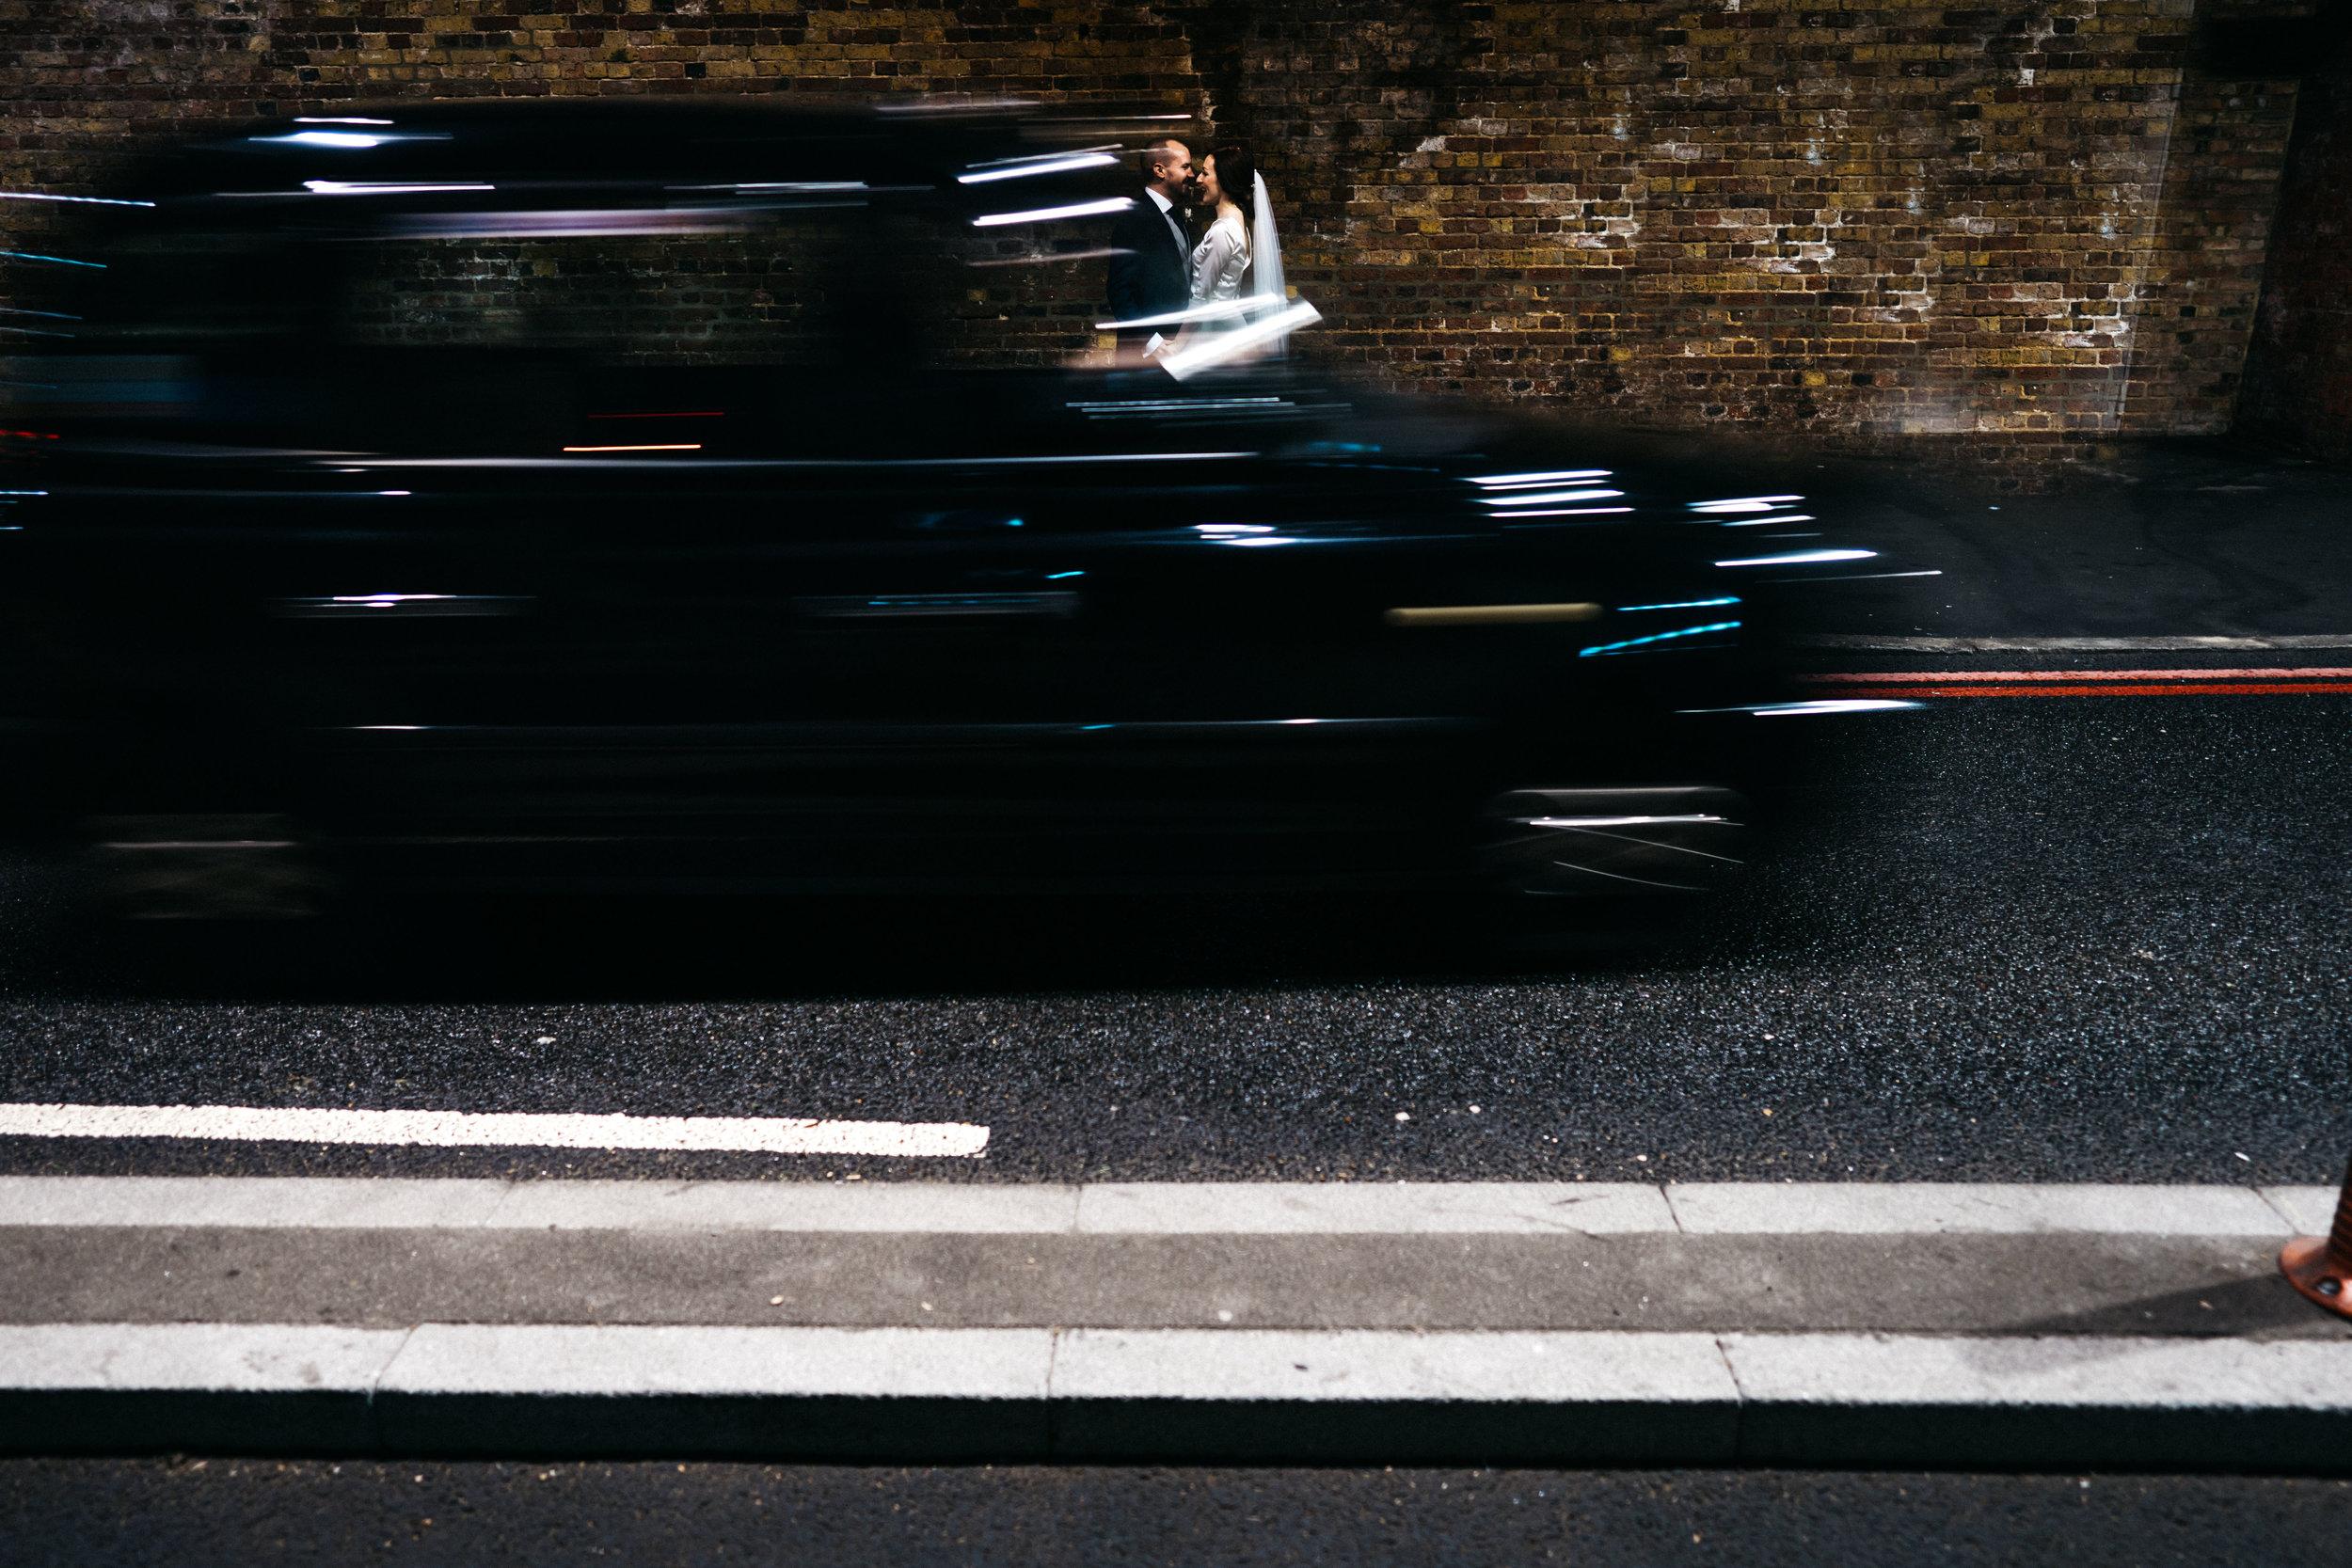 London Taxi Wedding Photo